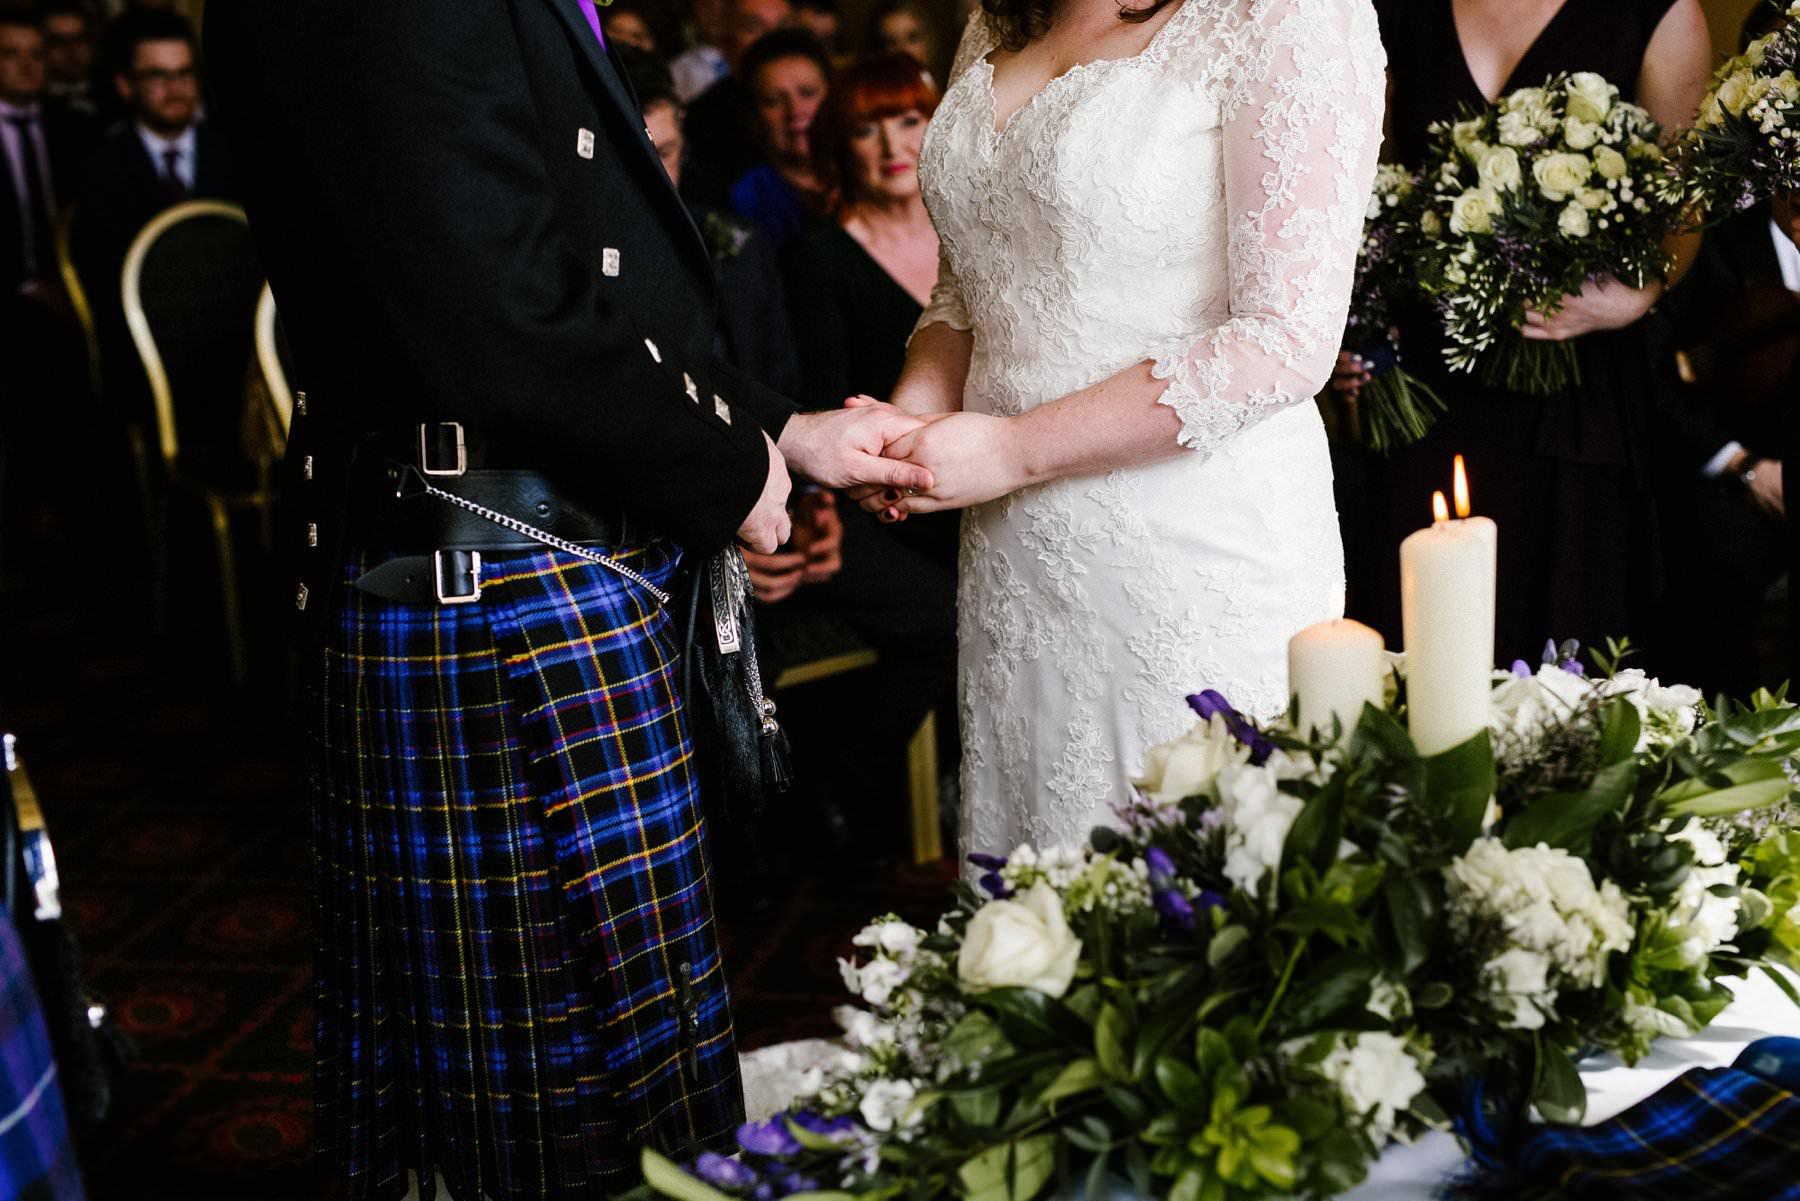 bride and kilt wearing groom exchange rings during wedding ceremony at Belfast Castle